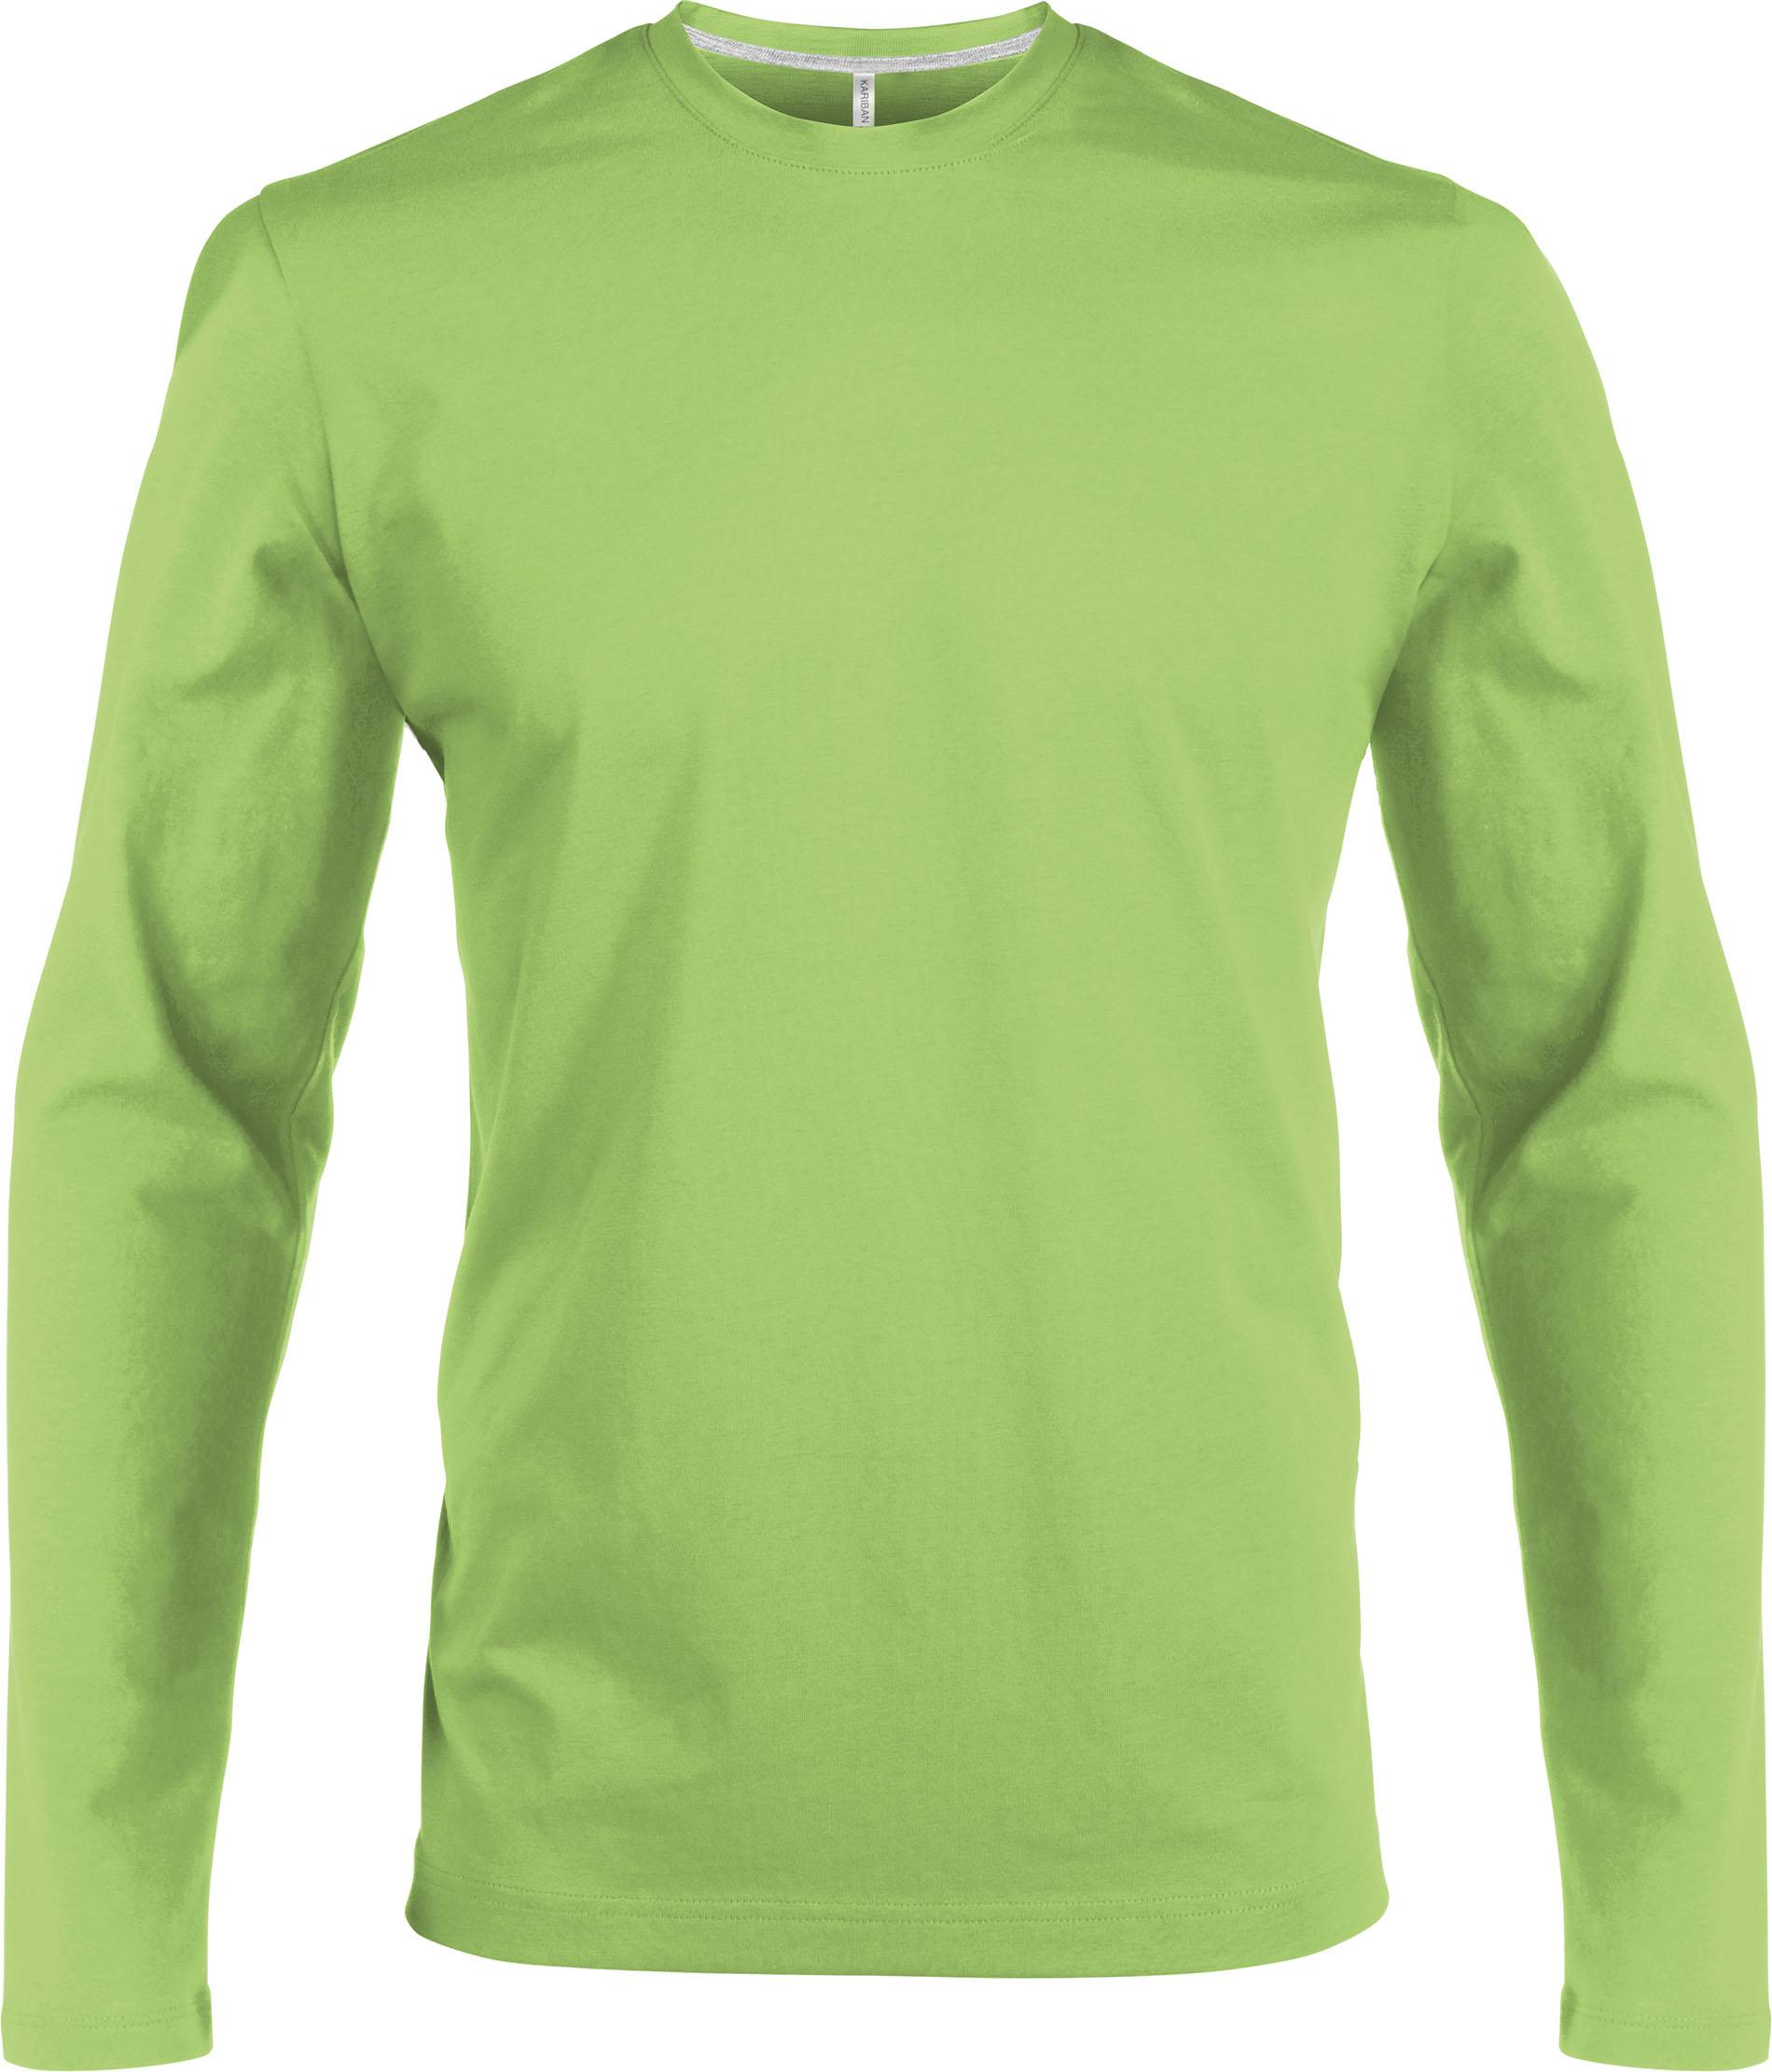 T-paita K359 O-aukko PH Lime